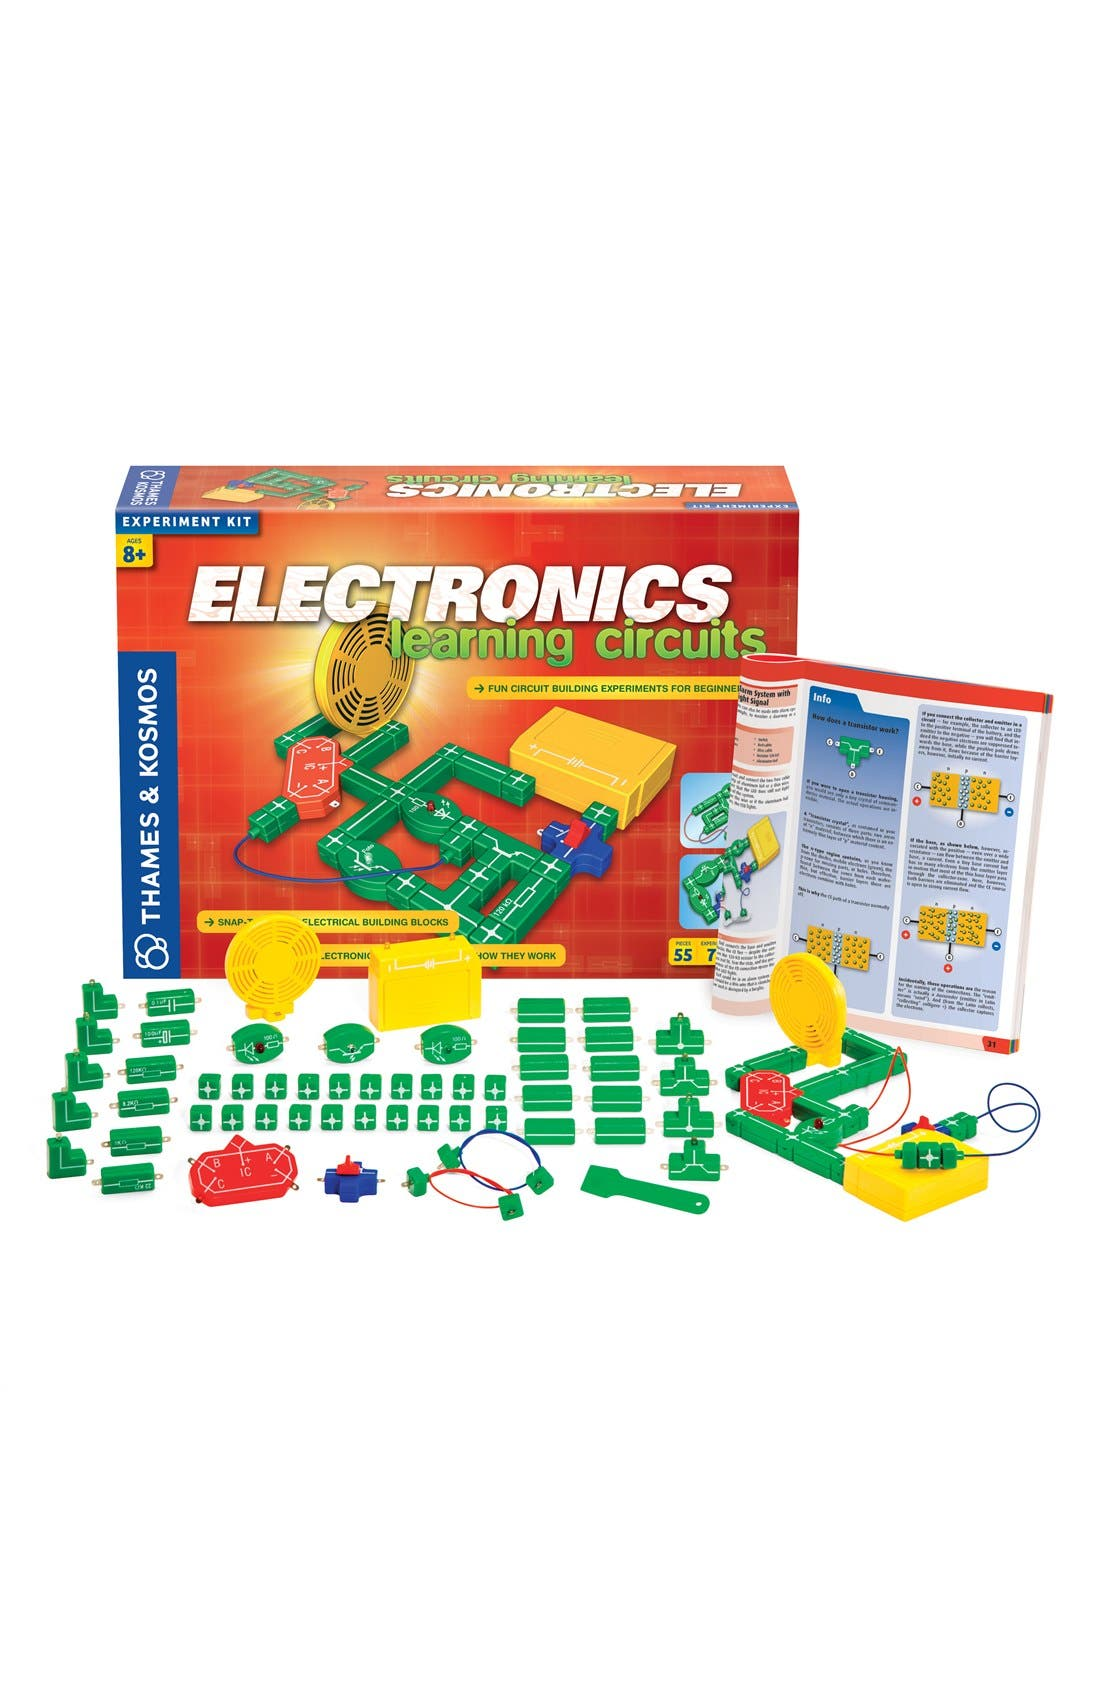 THAMES & KOSMOS 'Electronics Learning Circuits' Experiment Kit